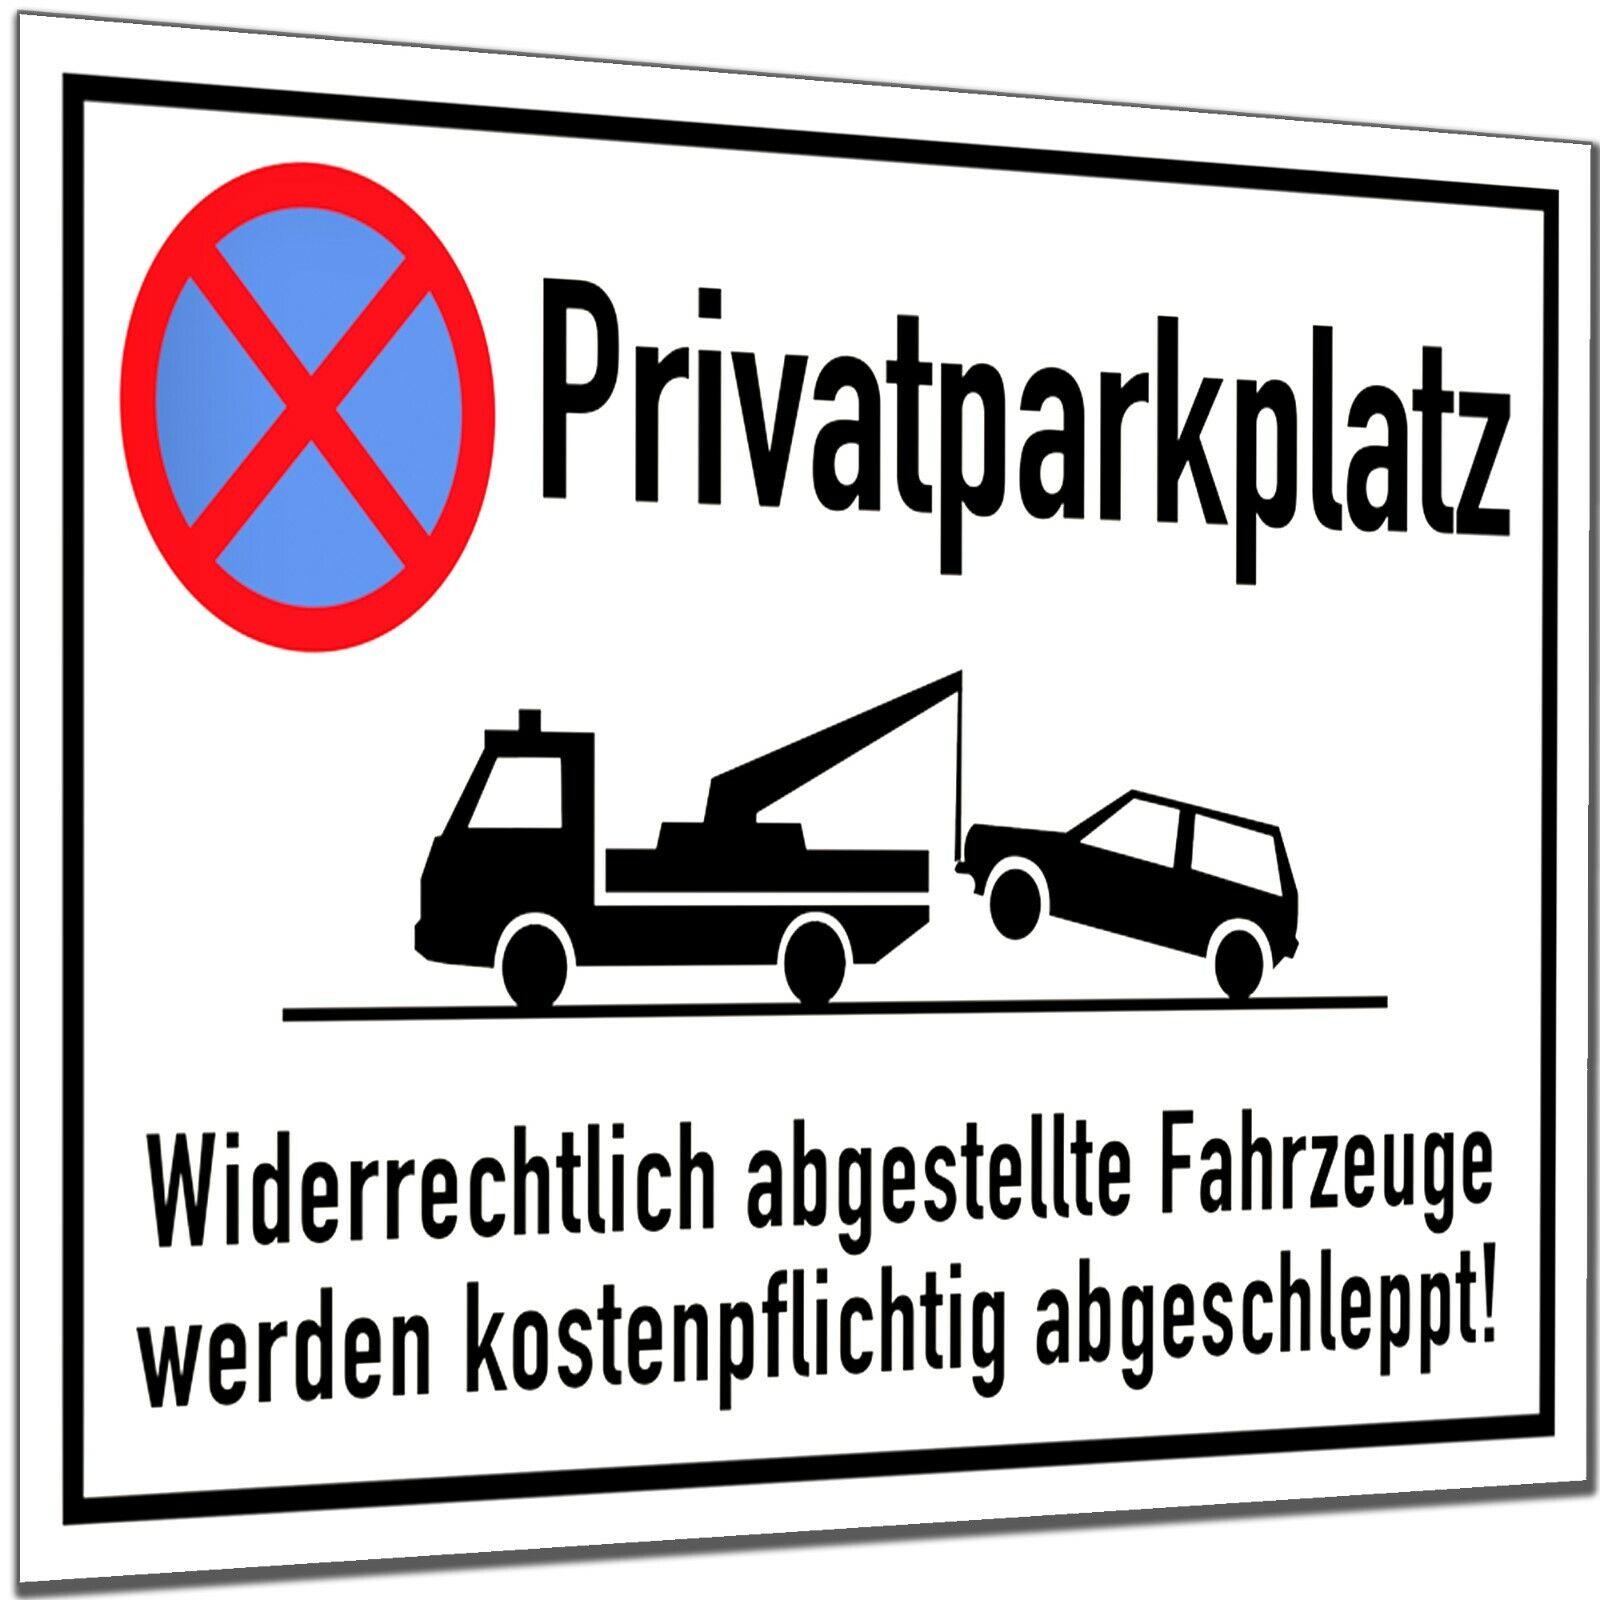 Halteverbot Schild Parken verboten Parkverbot Hinweis Hartschaum 30x20cm 3mm